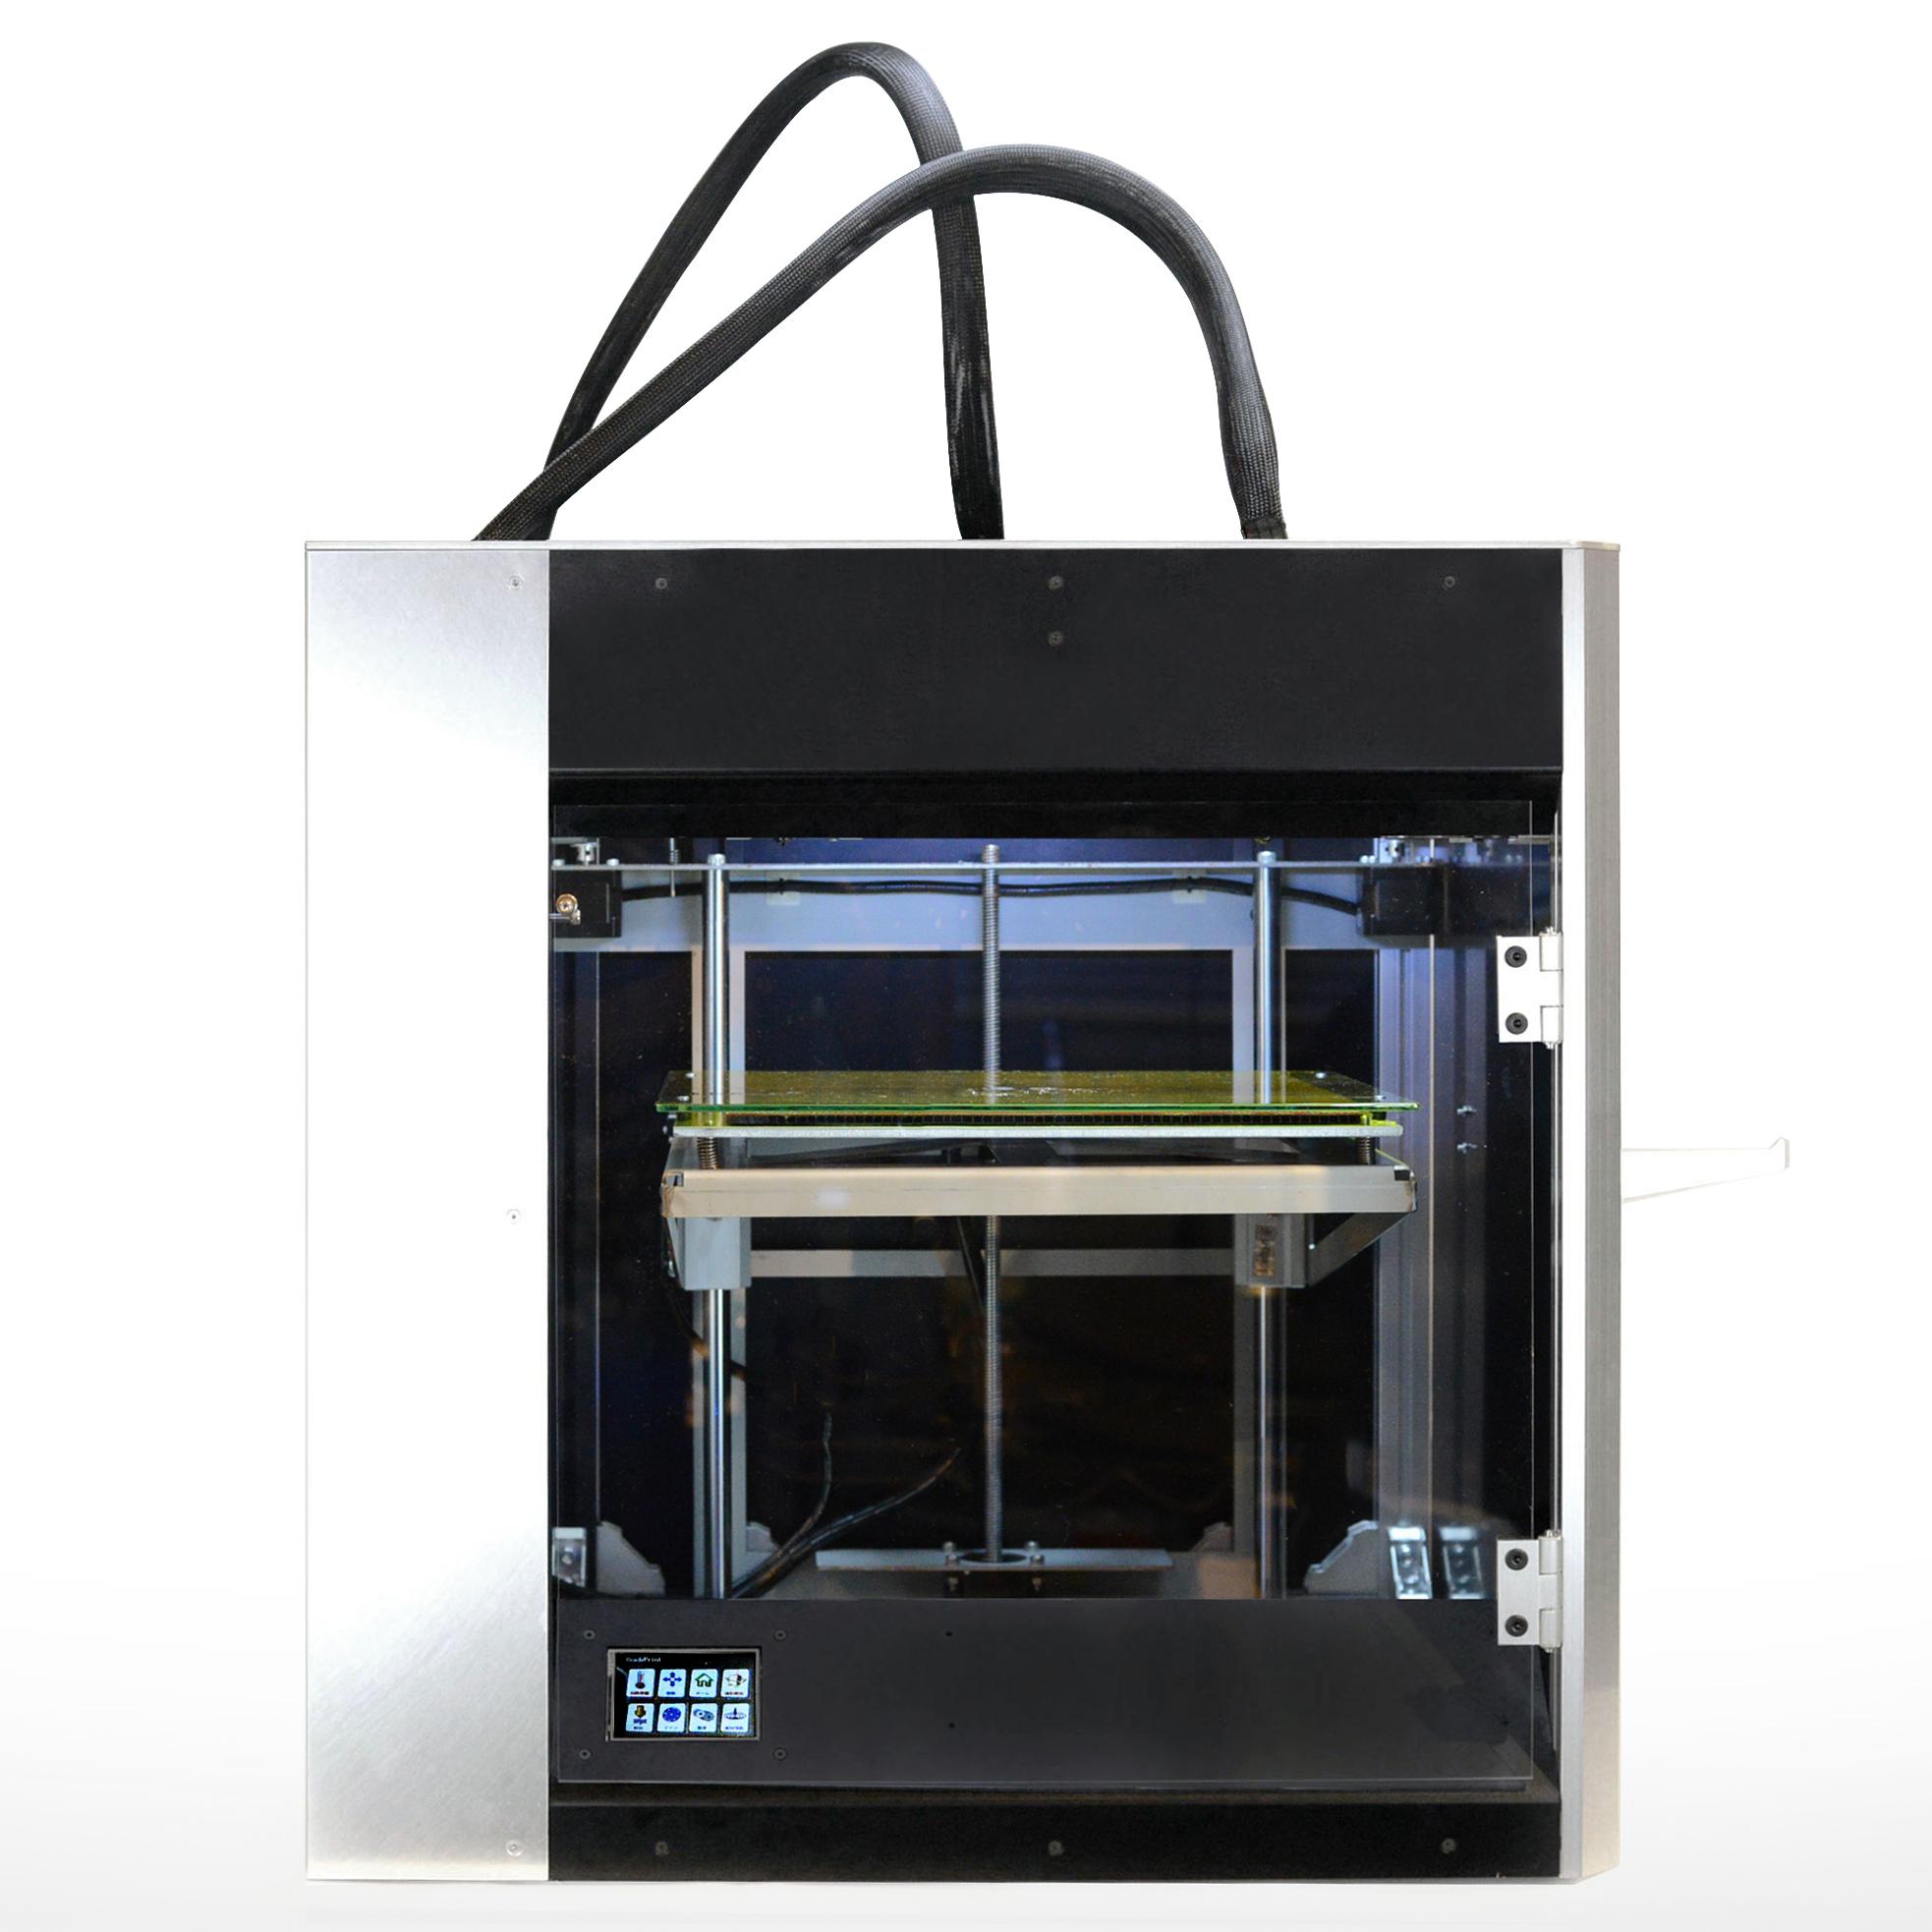 TITAN3 3Dプリンター - 画像1